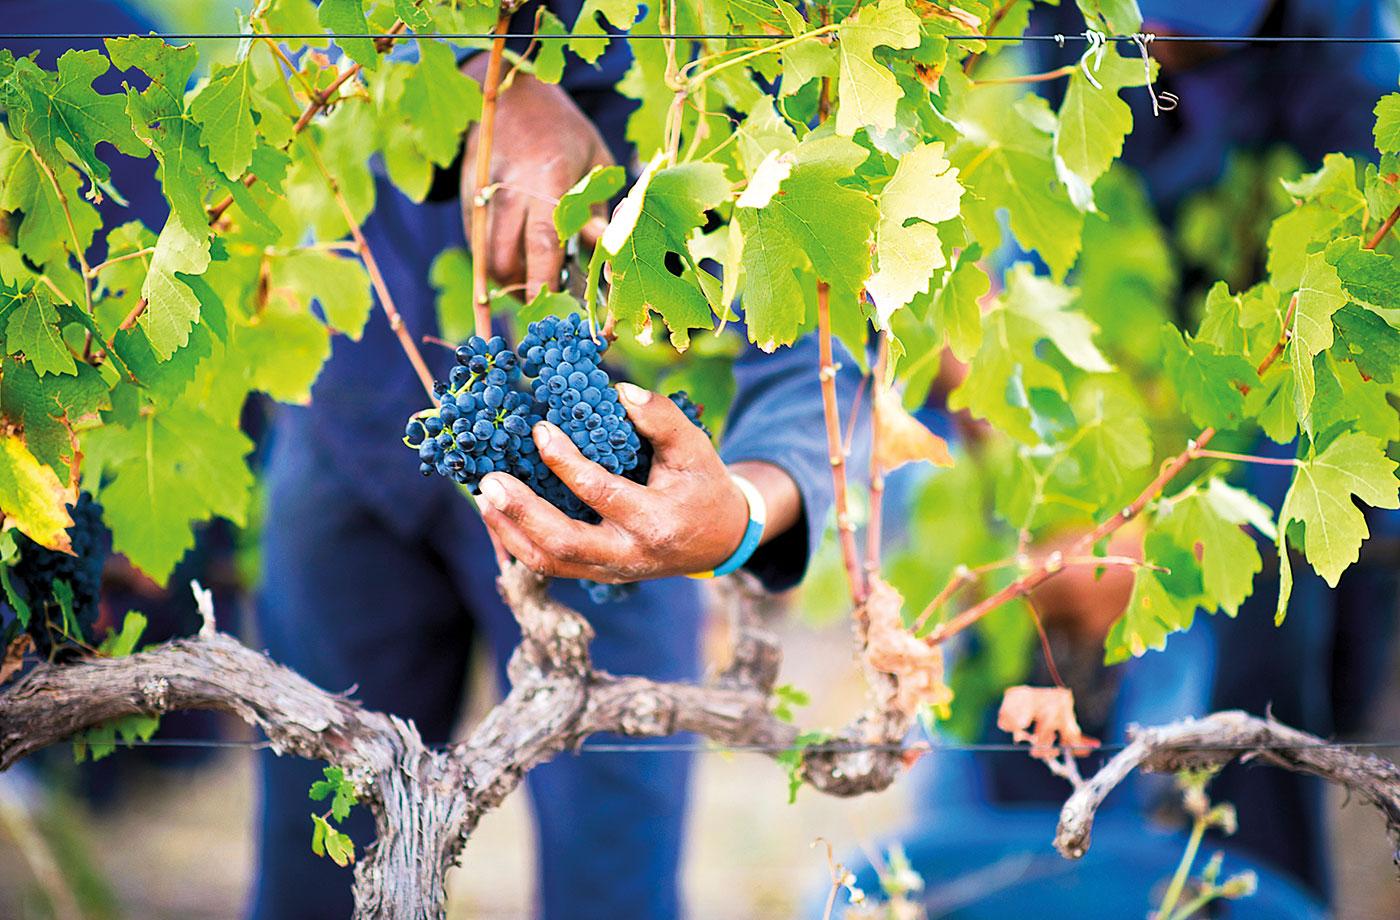 Hortfin Picking Grapes